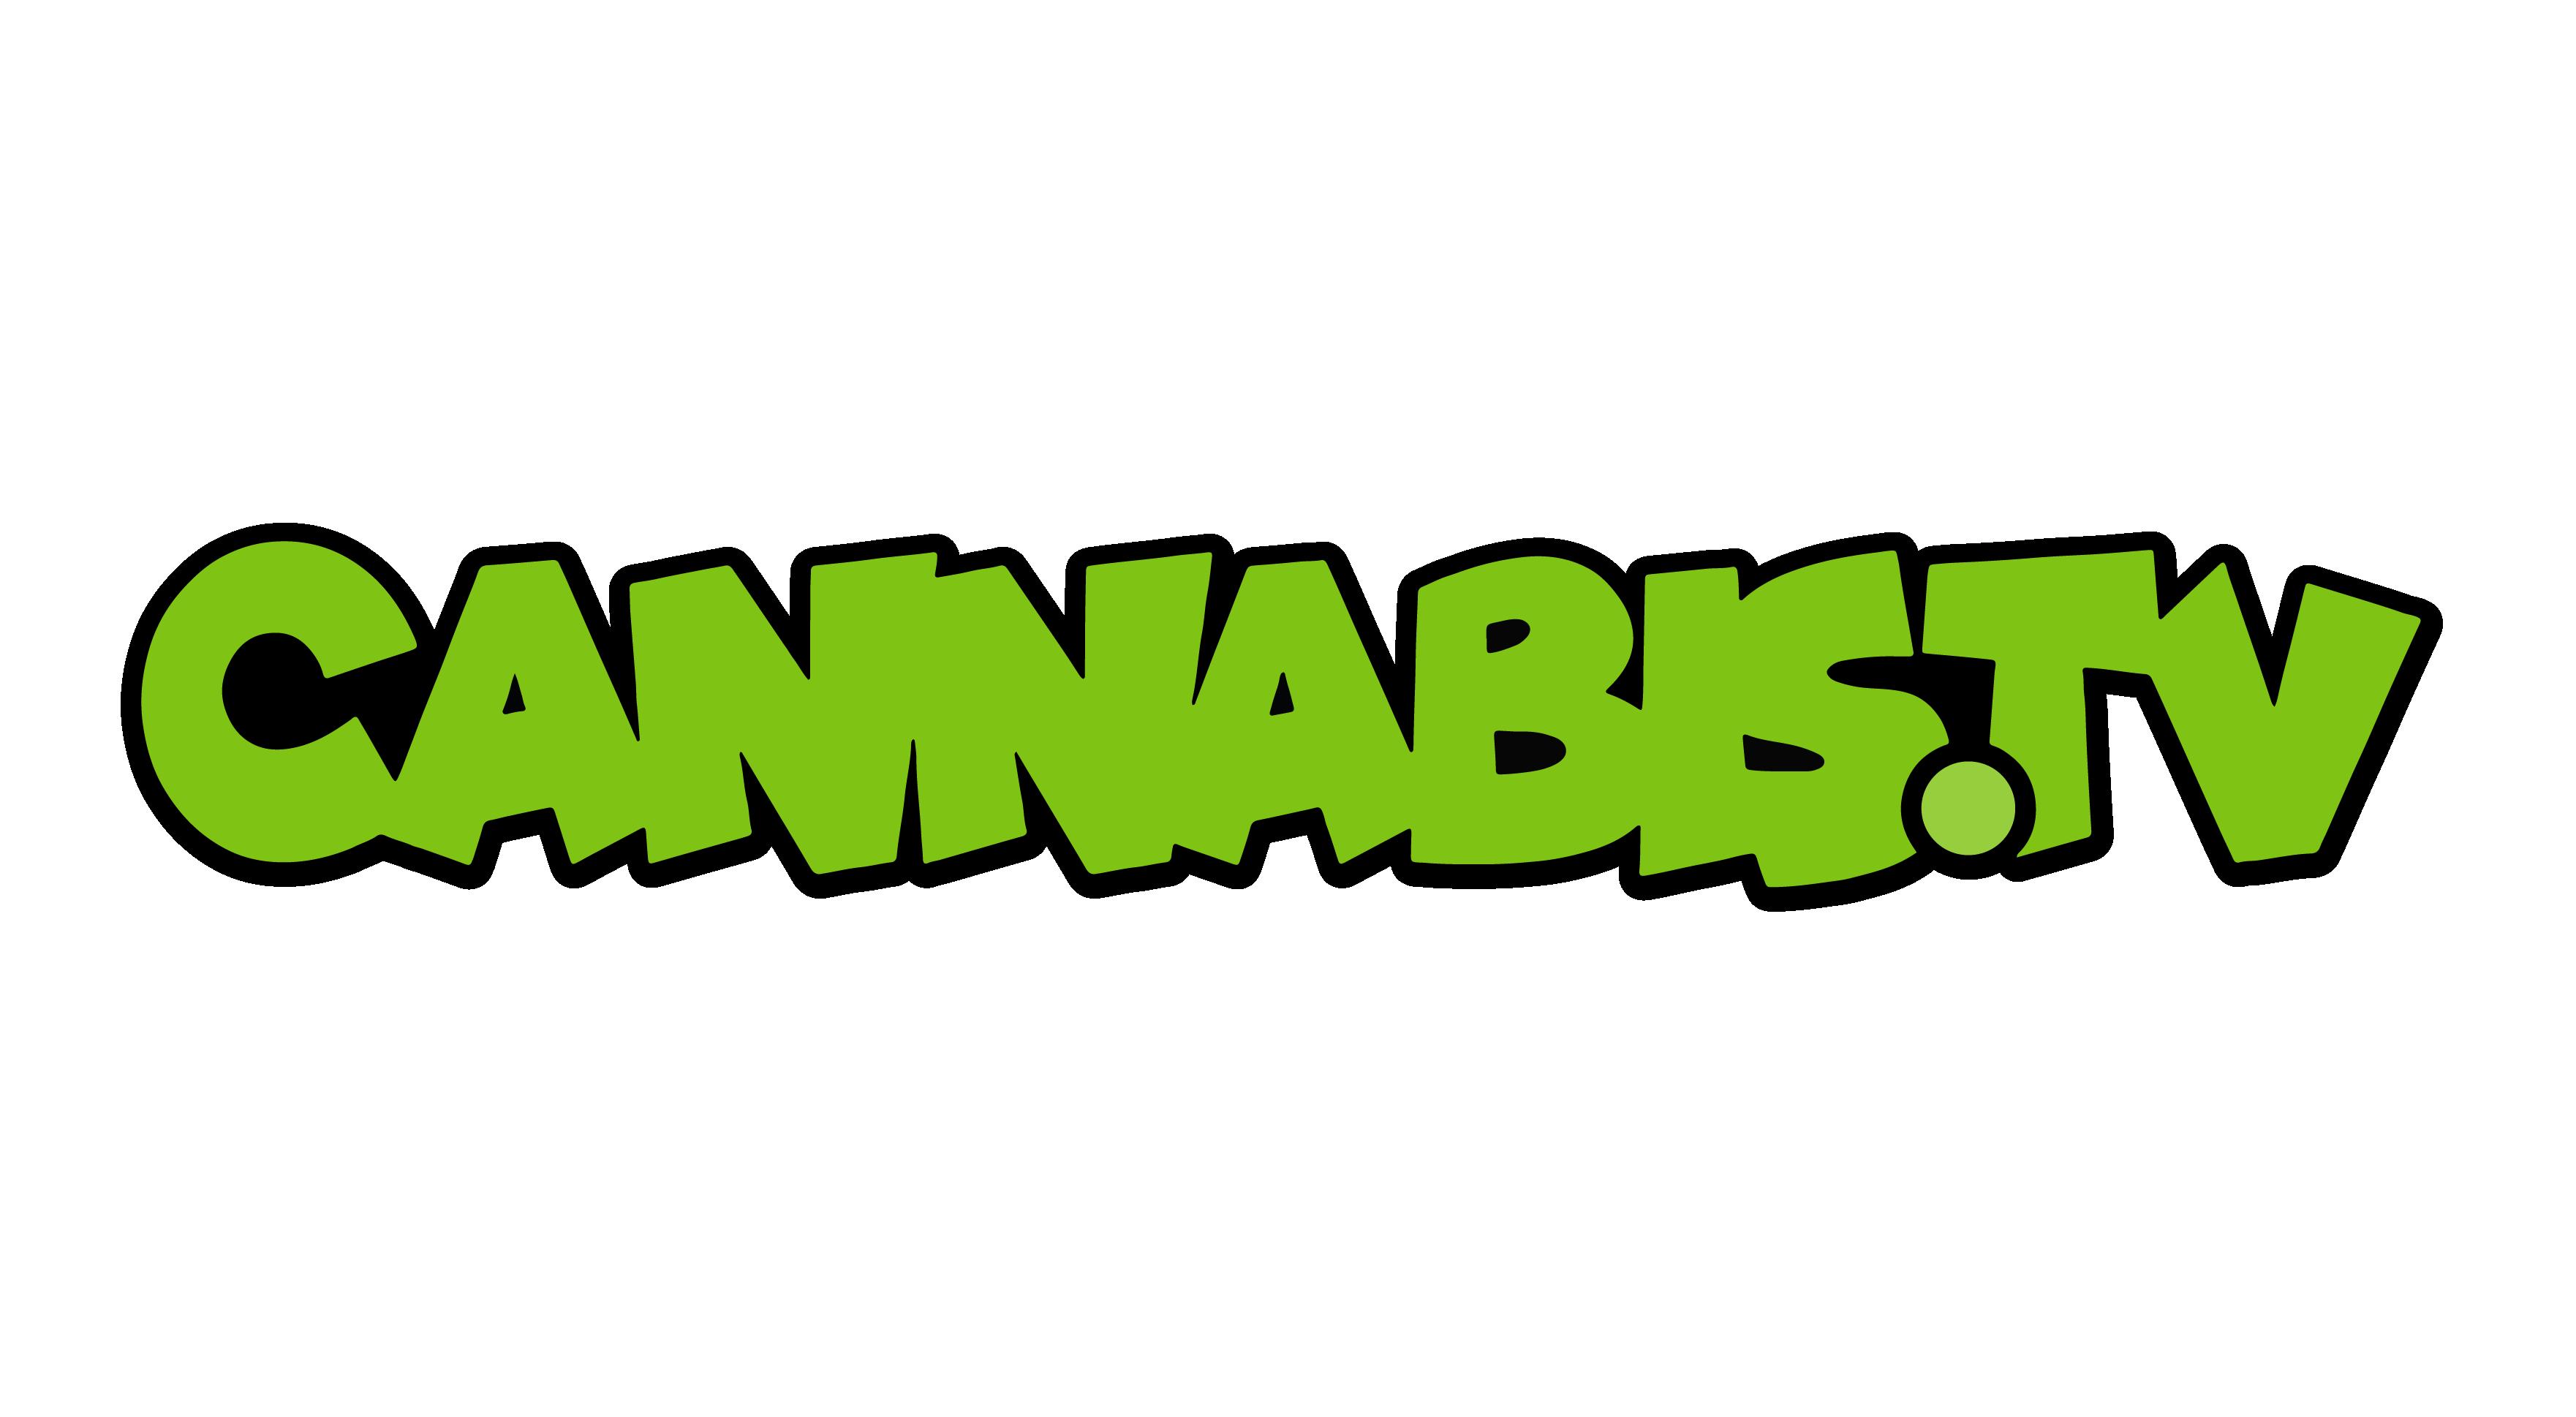 Cannabisdottv.com